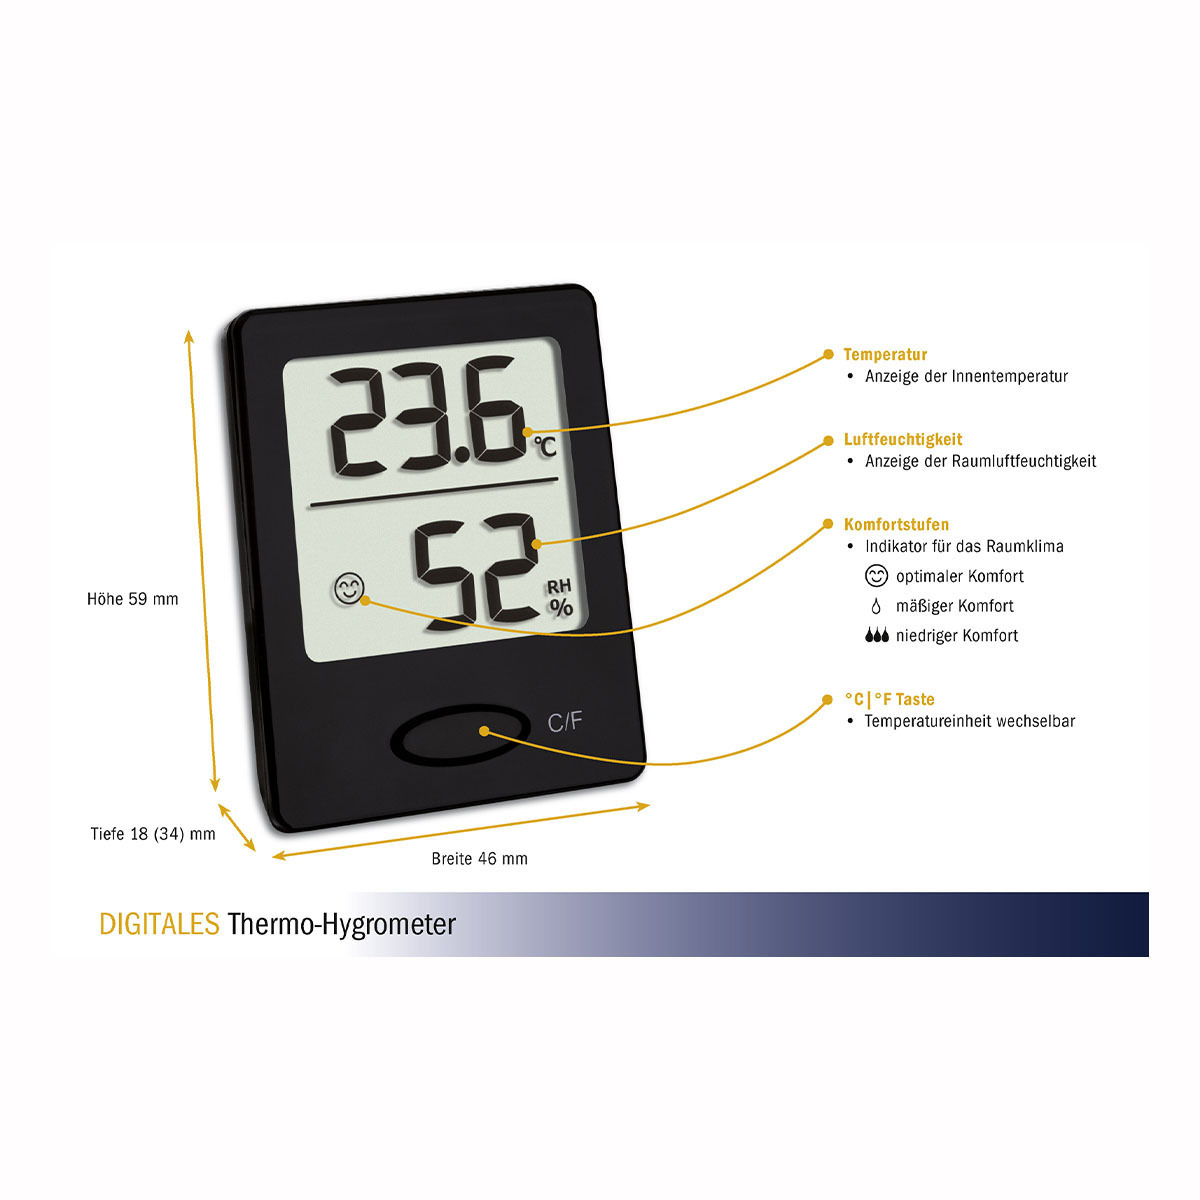 30-5041-01-digitales-thermo-hygrometer-abmessungen-1200x1200px.jpg